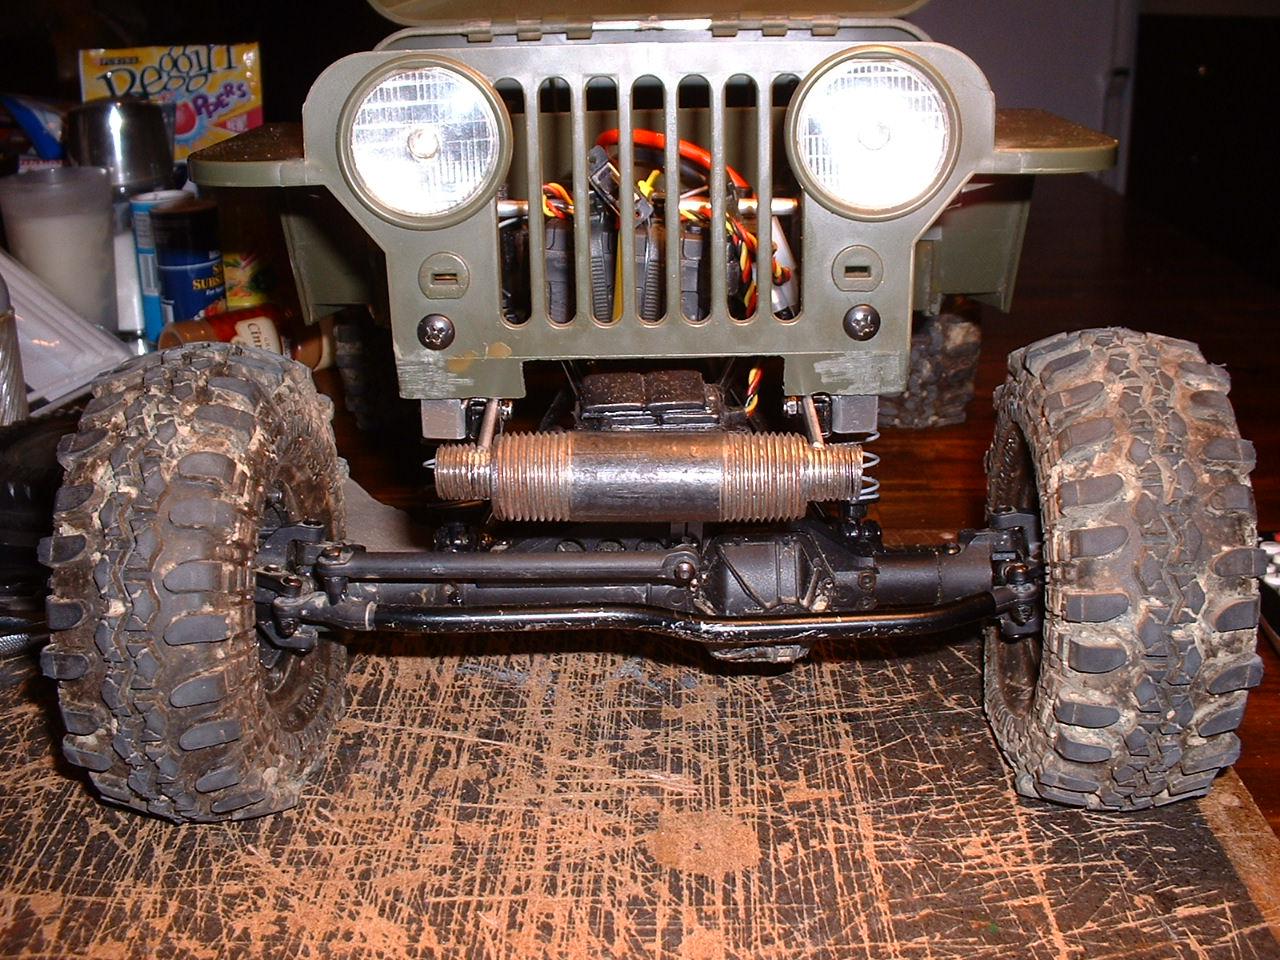 Click image for larger version  Name:G.I. Joe Jeep 6 002.JPG Views:918 Size:335.5 KB ID:2051073